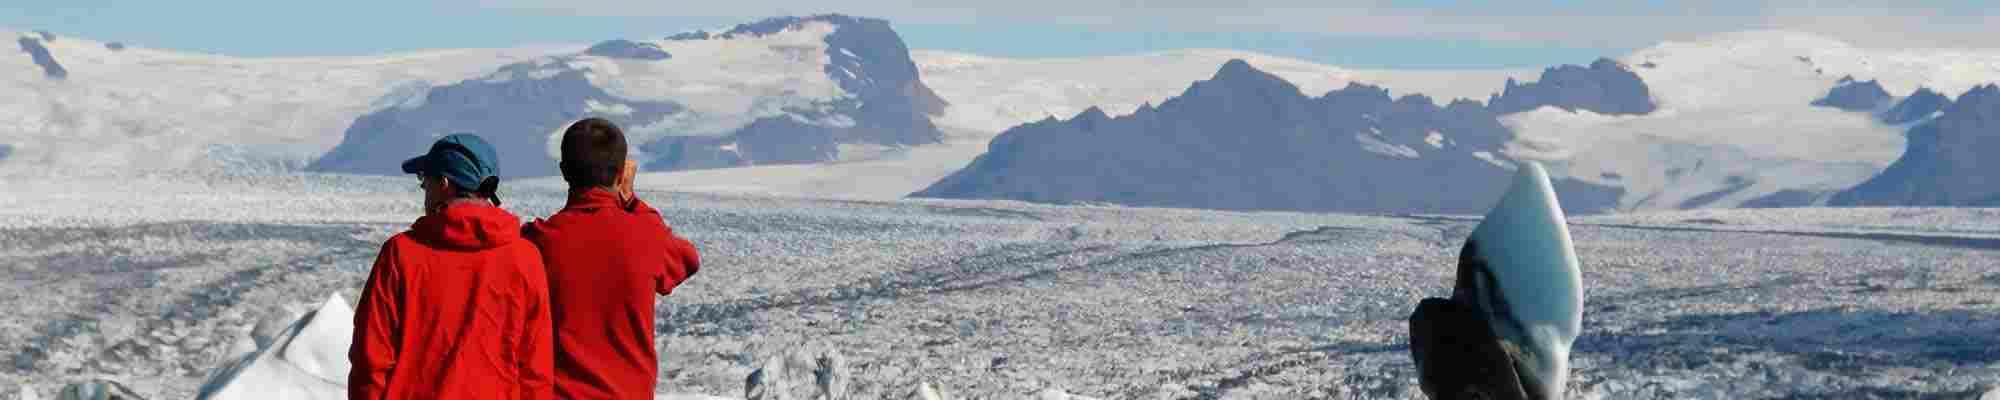 Jokulsarlon Lake and Breidamerkurjokull Glacier, Iceland photo